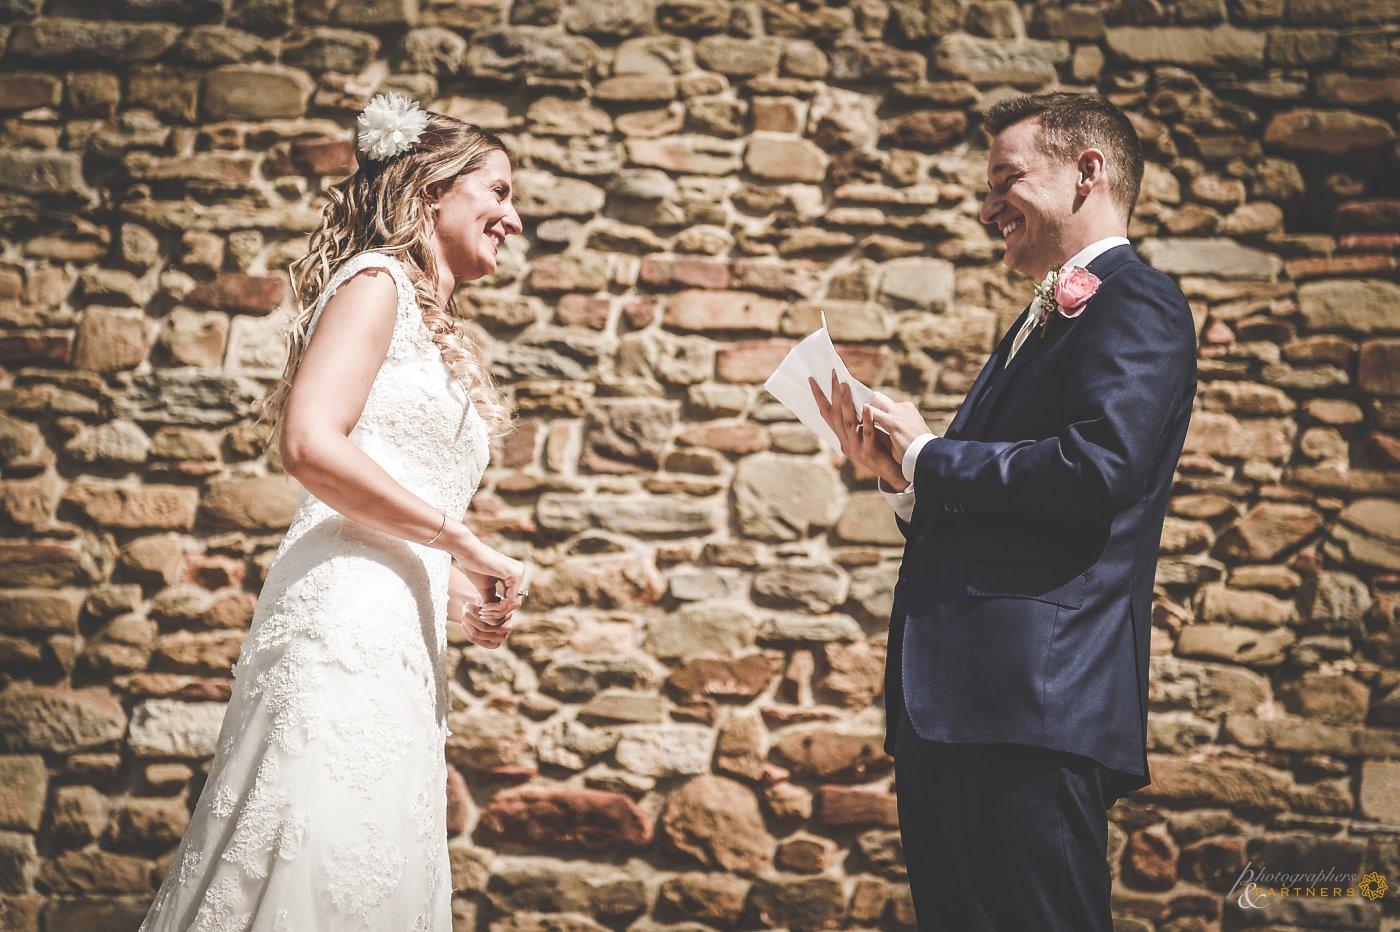 photography_weddings_scarlino_09.jpg